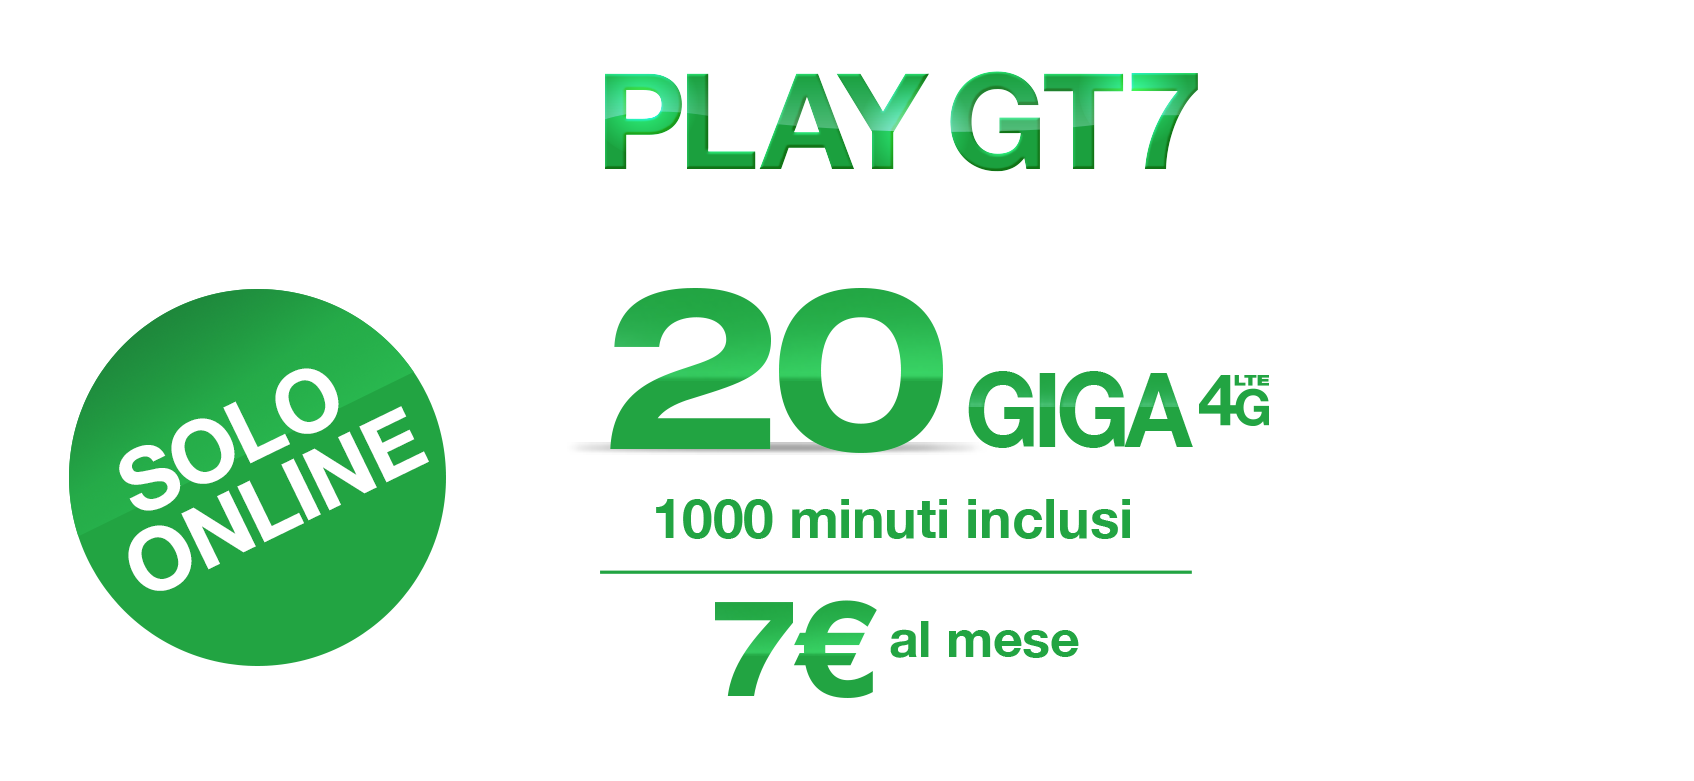 3 Italia Play GT7